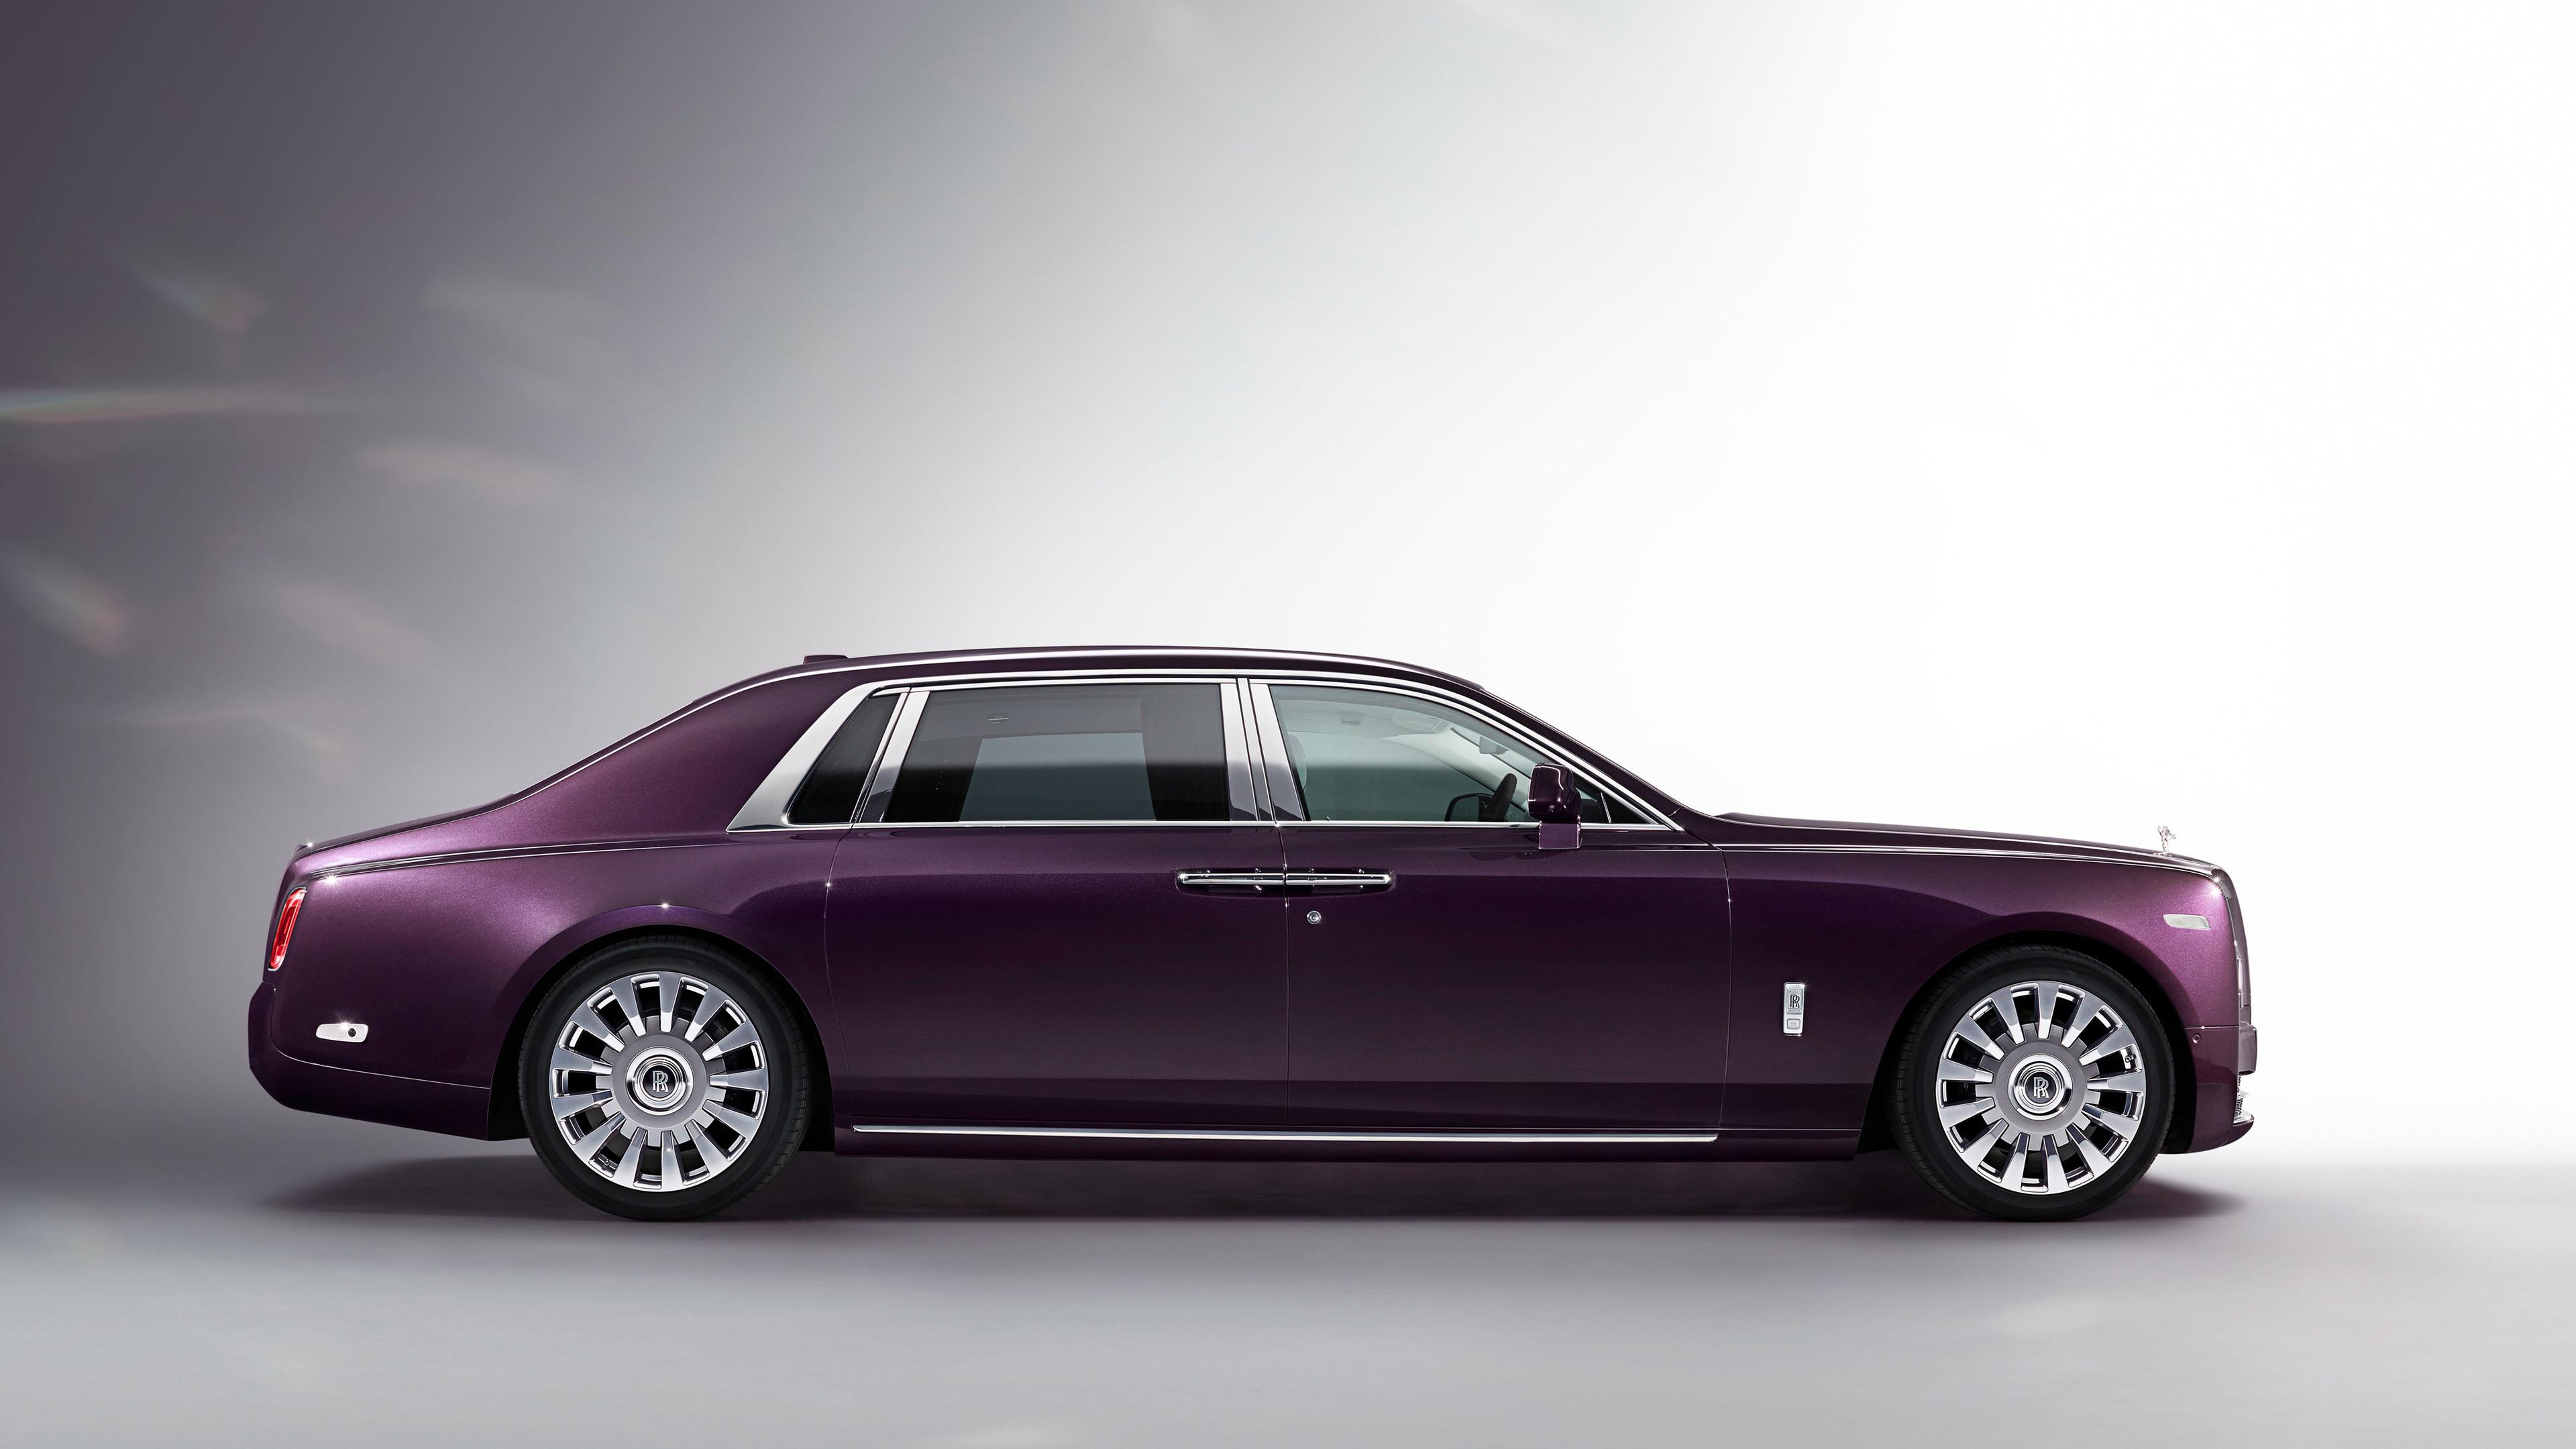 rolls royce phantom ewb 2017 1539105932 - Rolls Royce Phantom EWB 2017 - rolls royce wallpapers, rolls royce phantom wallpapers, rolls royce phantom ewb wallpapers, hd-wallpapers, cars wallpapers, 4k-wallpapers, 2017 cars wallpapers